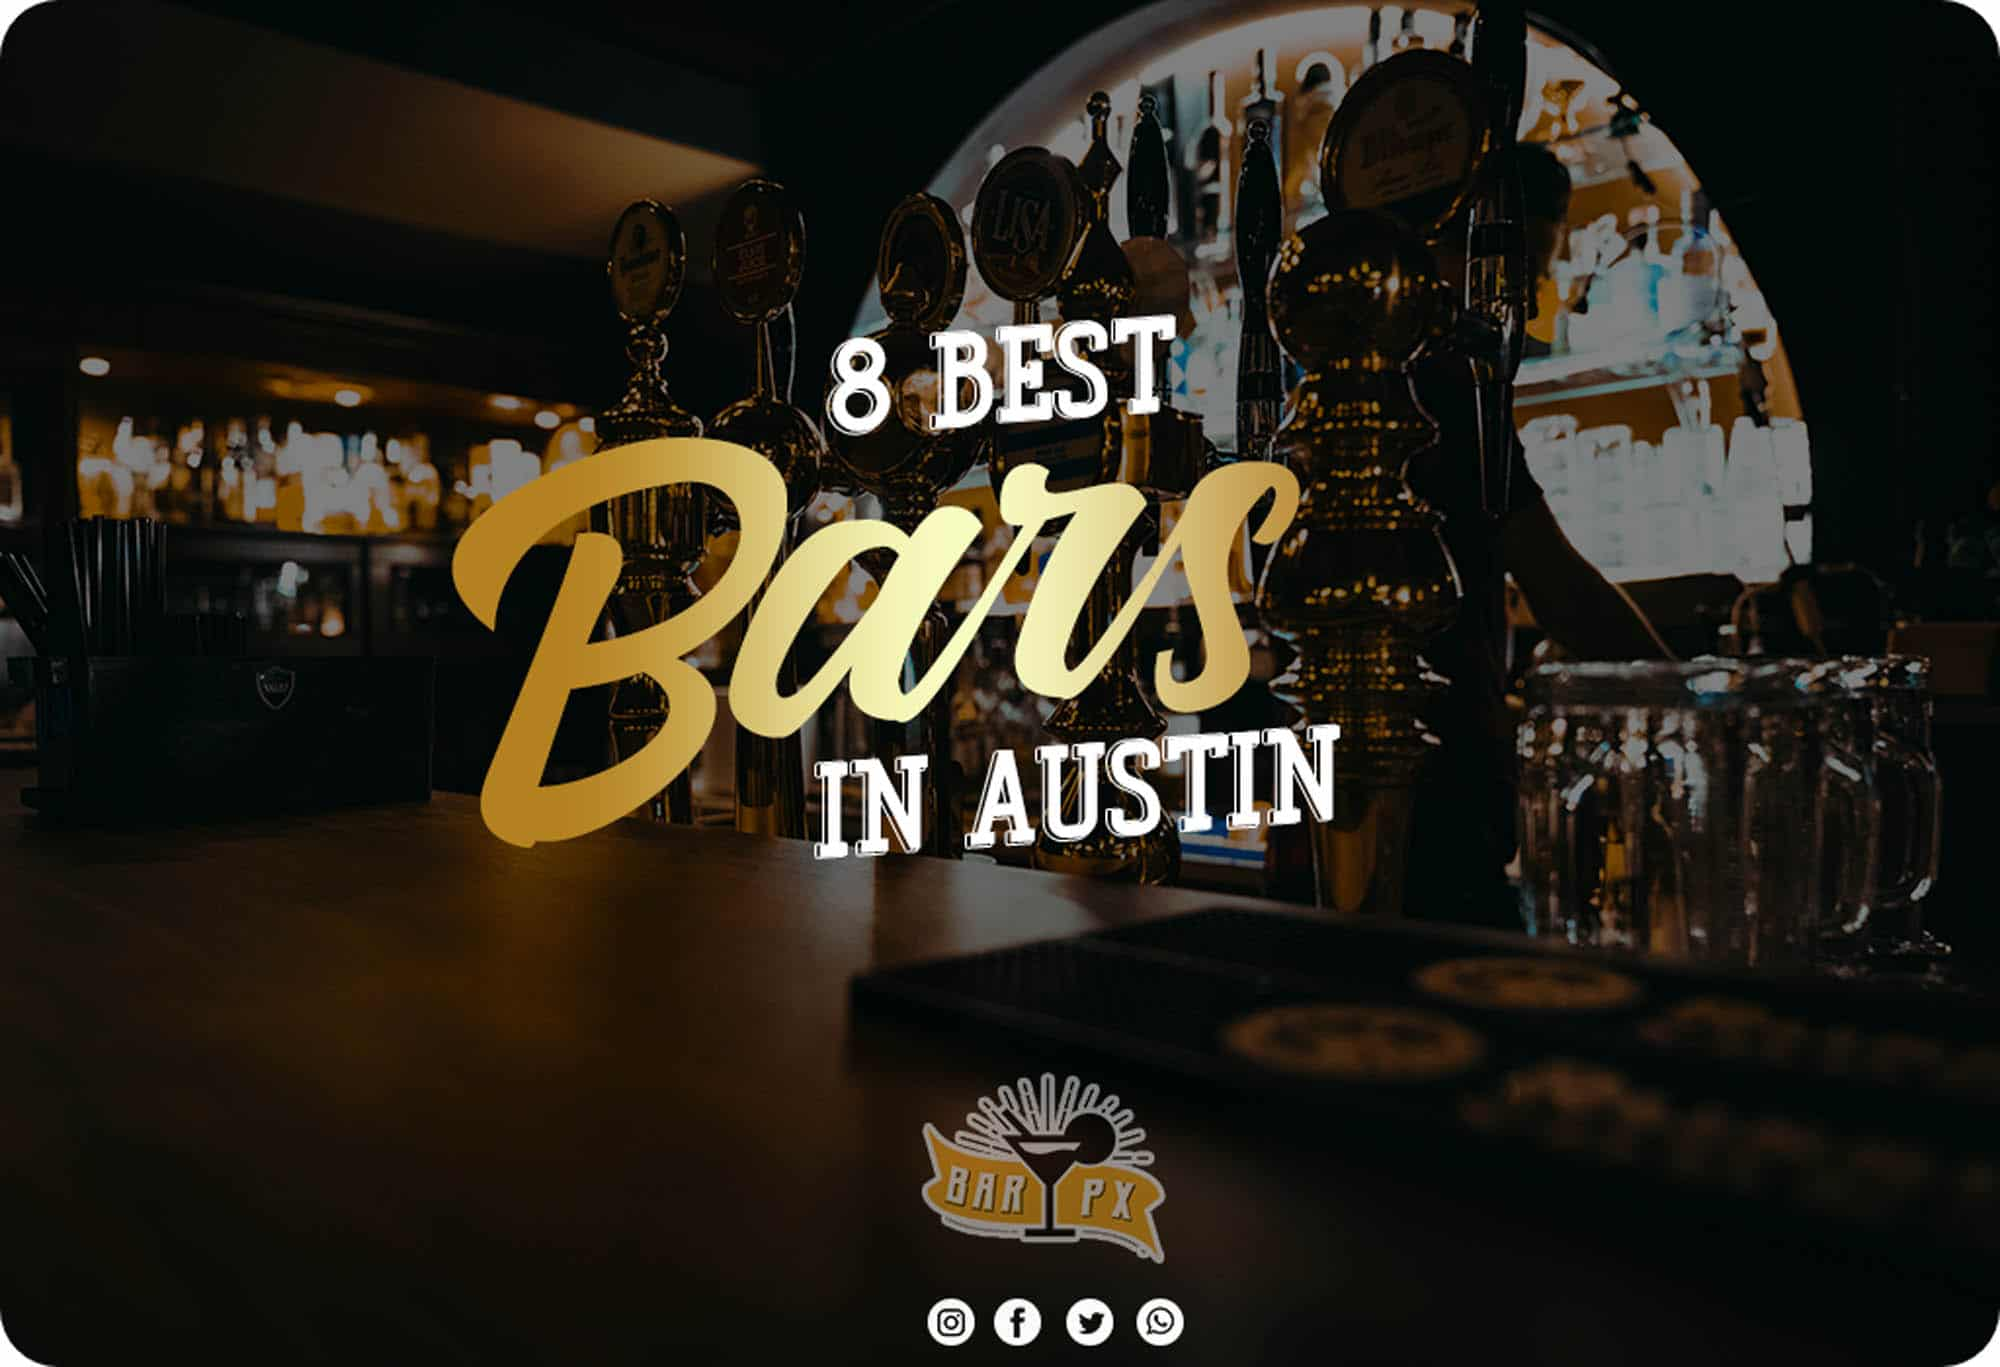 8 Best Bars in Austin (EPIC Guide) - BARPX